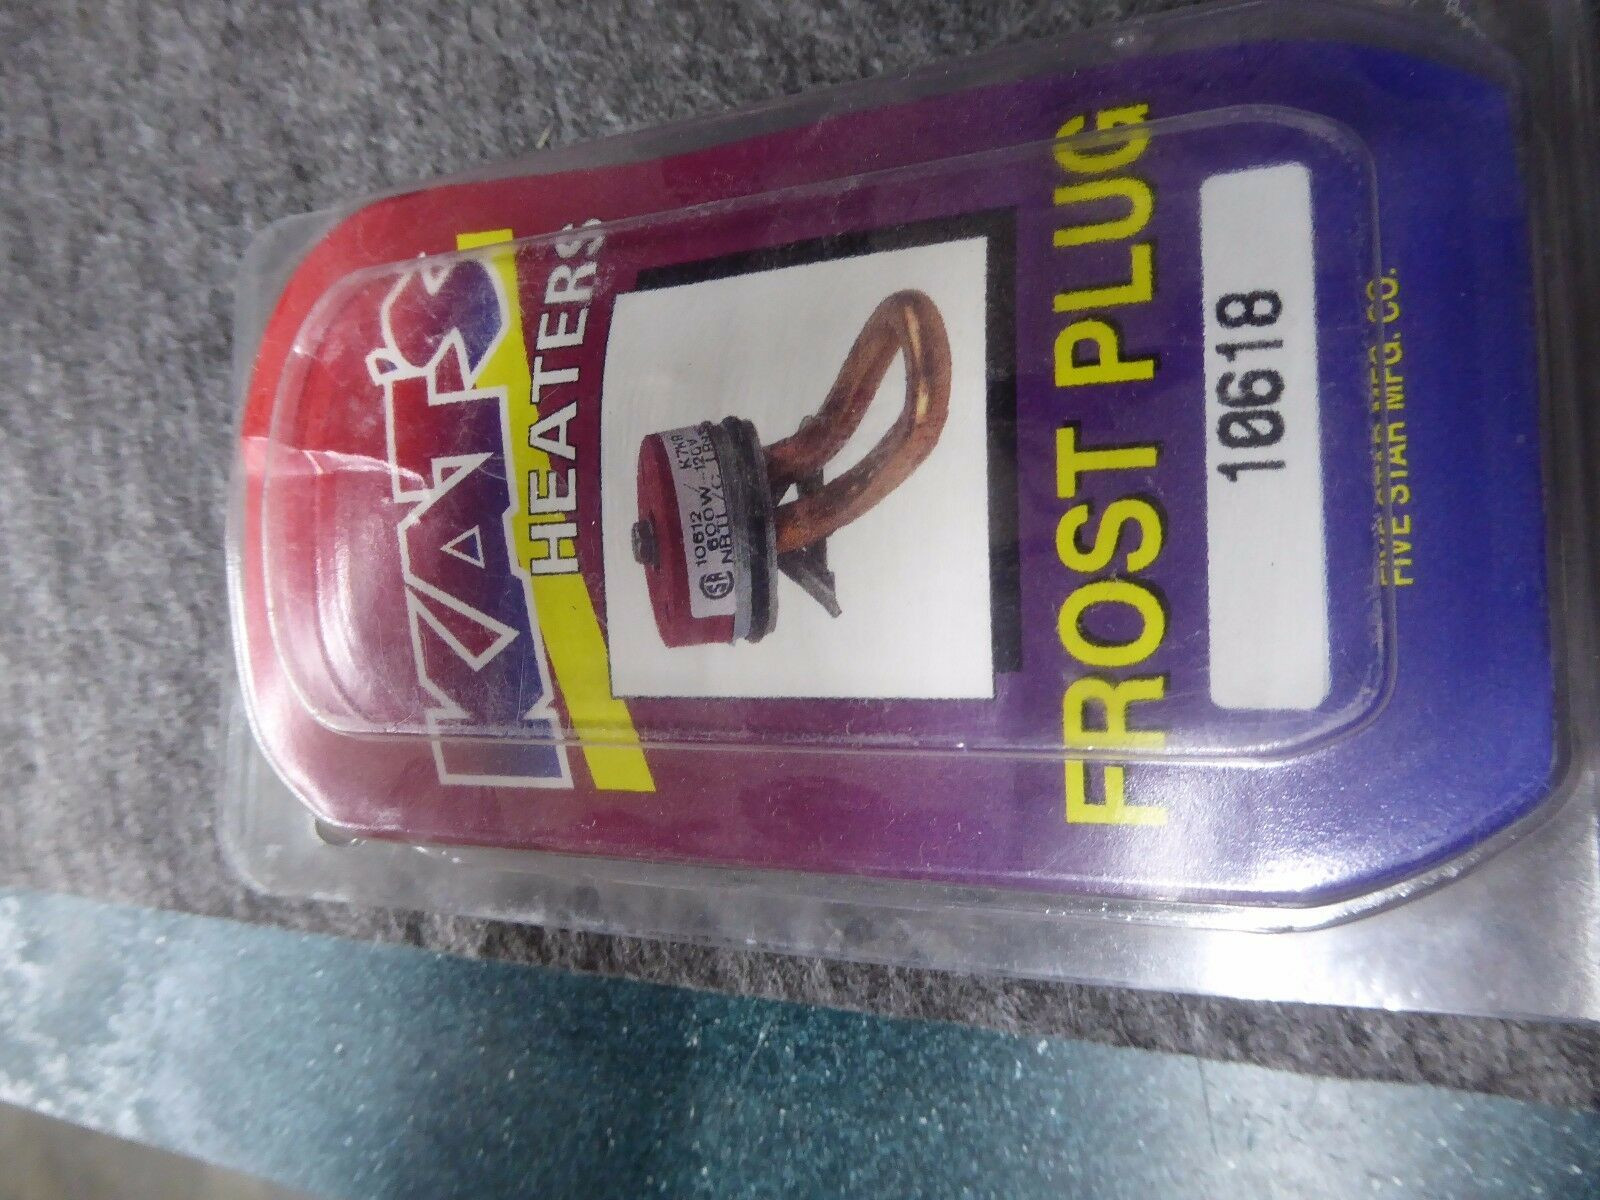 Kat's 10618 Frost Plug Engine Block Heater